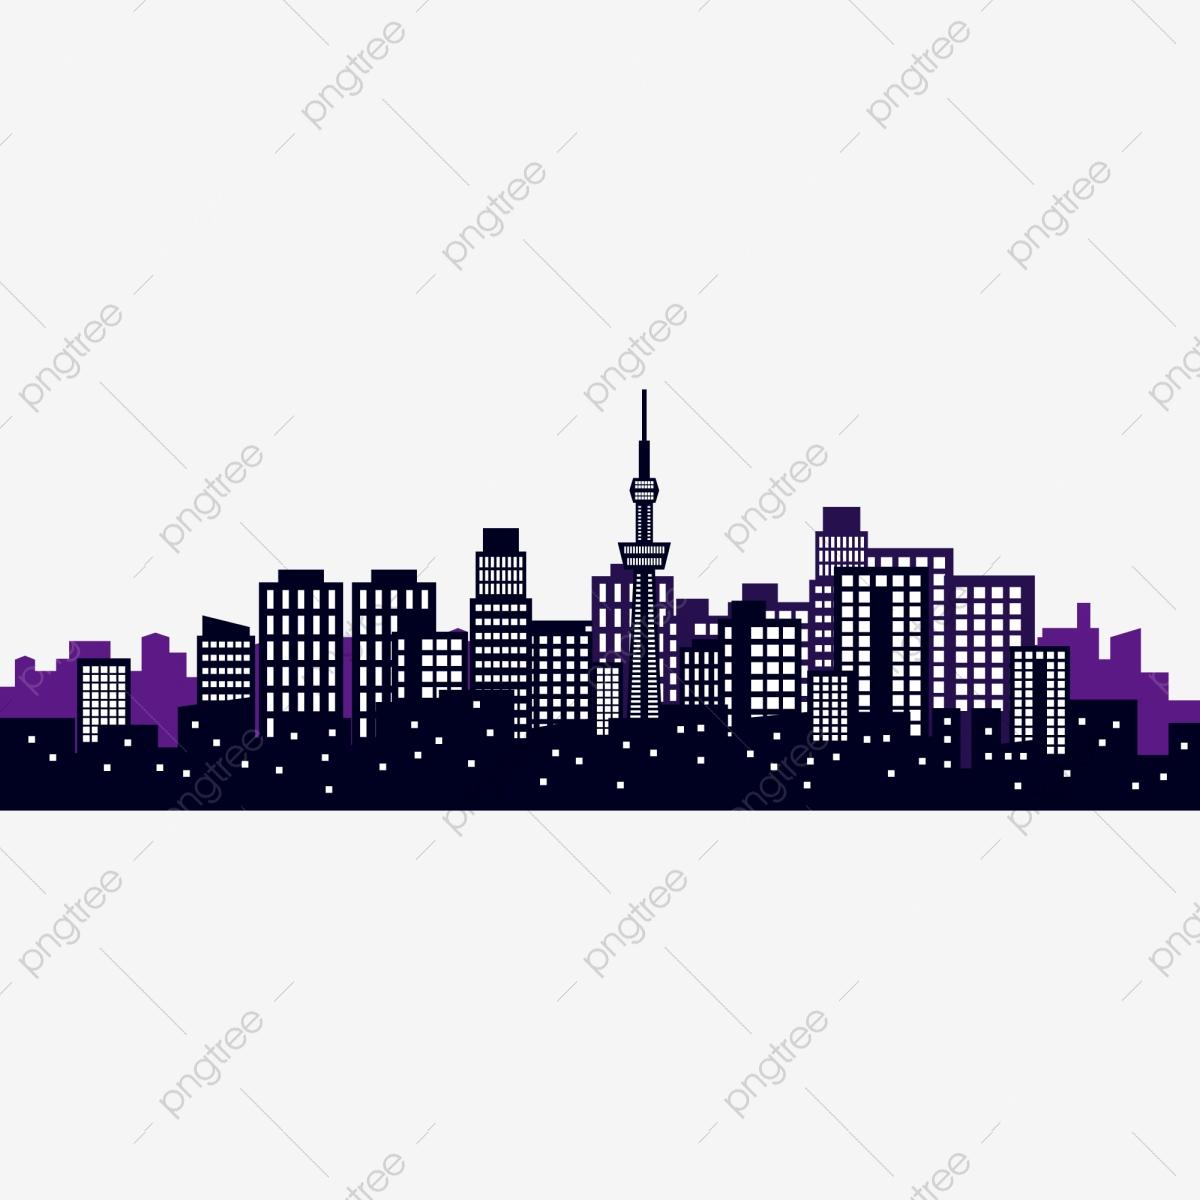 City City Silhouette Cartoon Hand Drawn City High Rise Building.